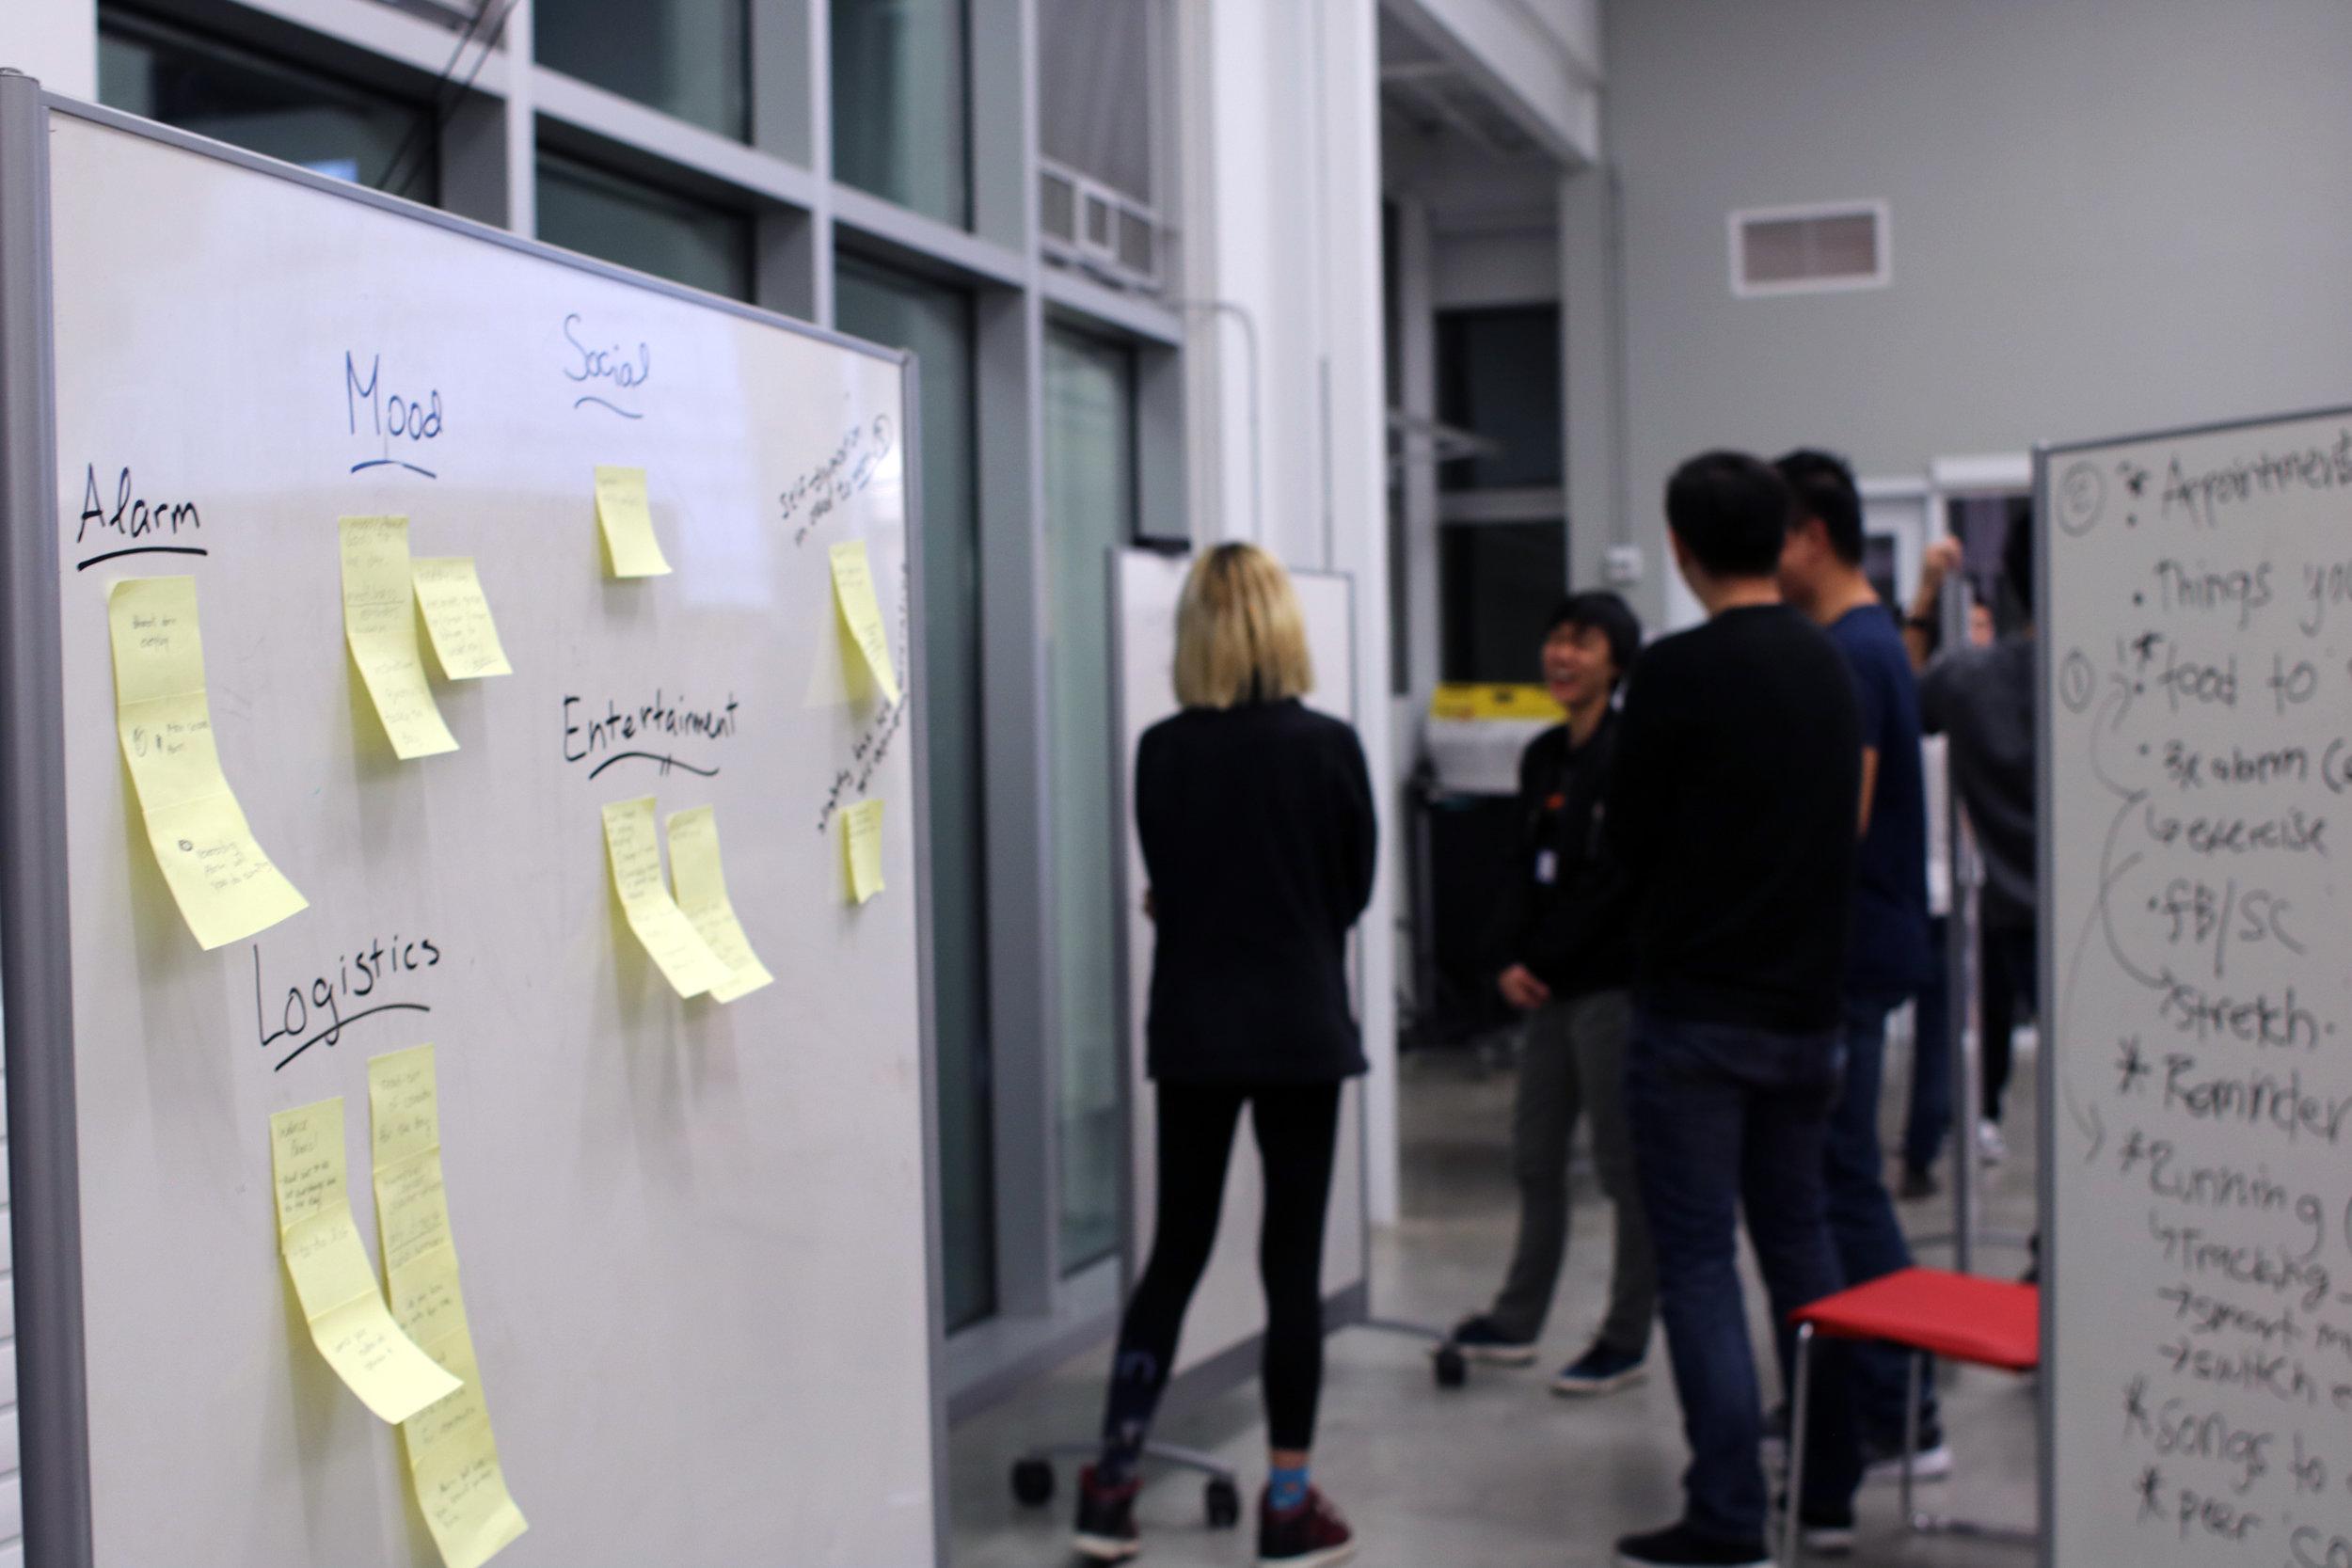 Bose Challenge:UC Berkeley - October 16th, 2018